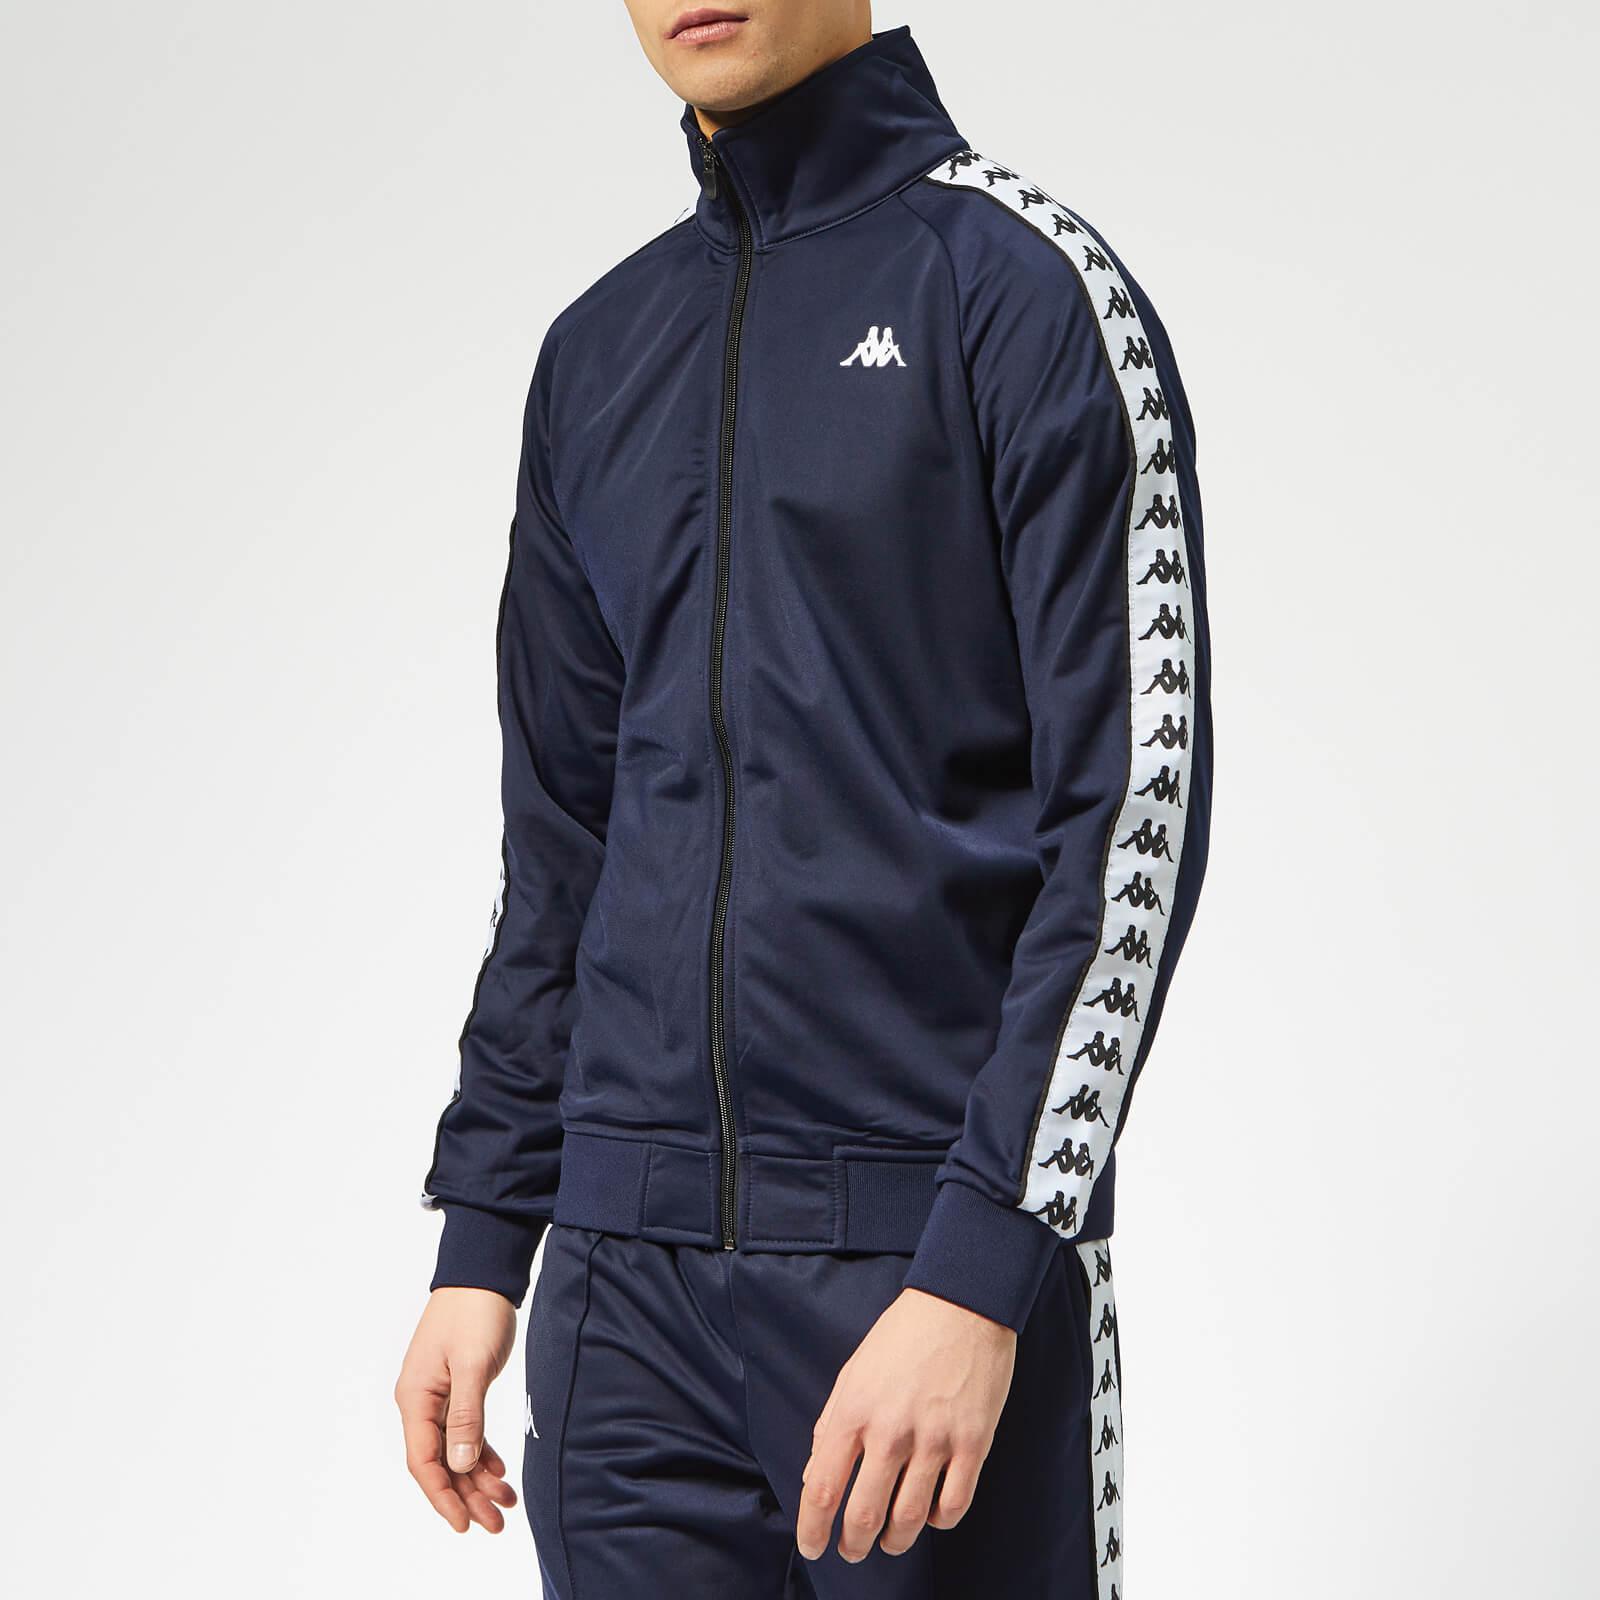 1b5246902af9 Kappa Men s Banda Anniston Track Jacket - Blue Marine White Black Clothing